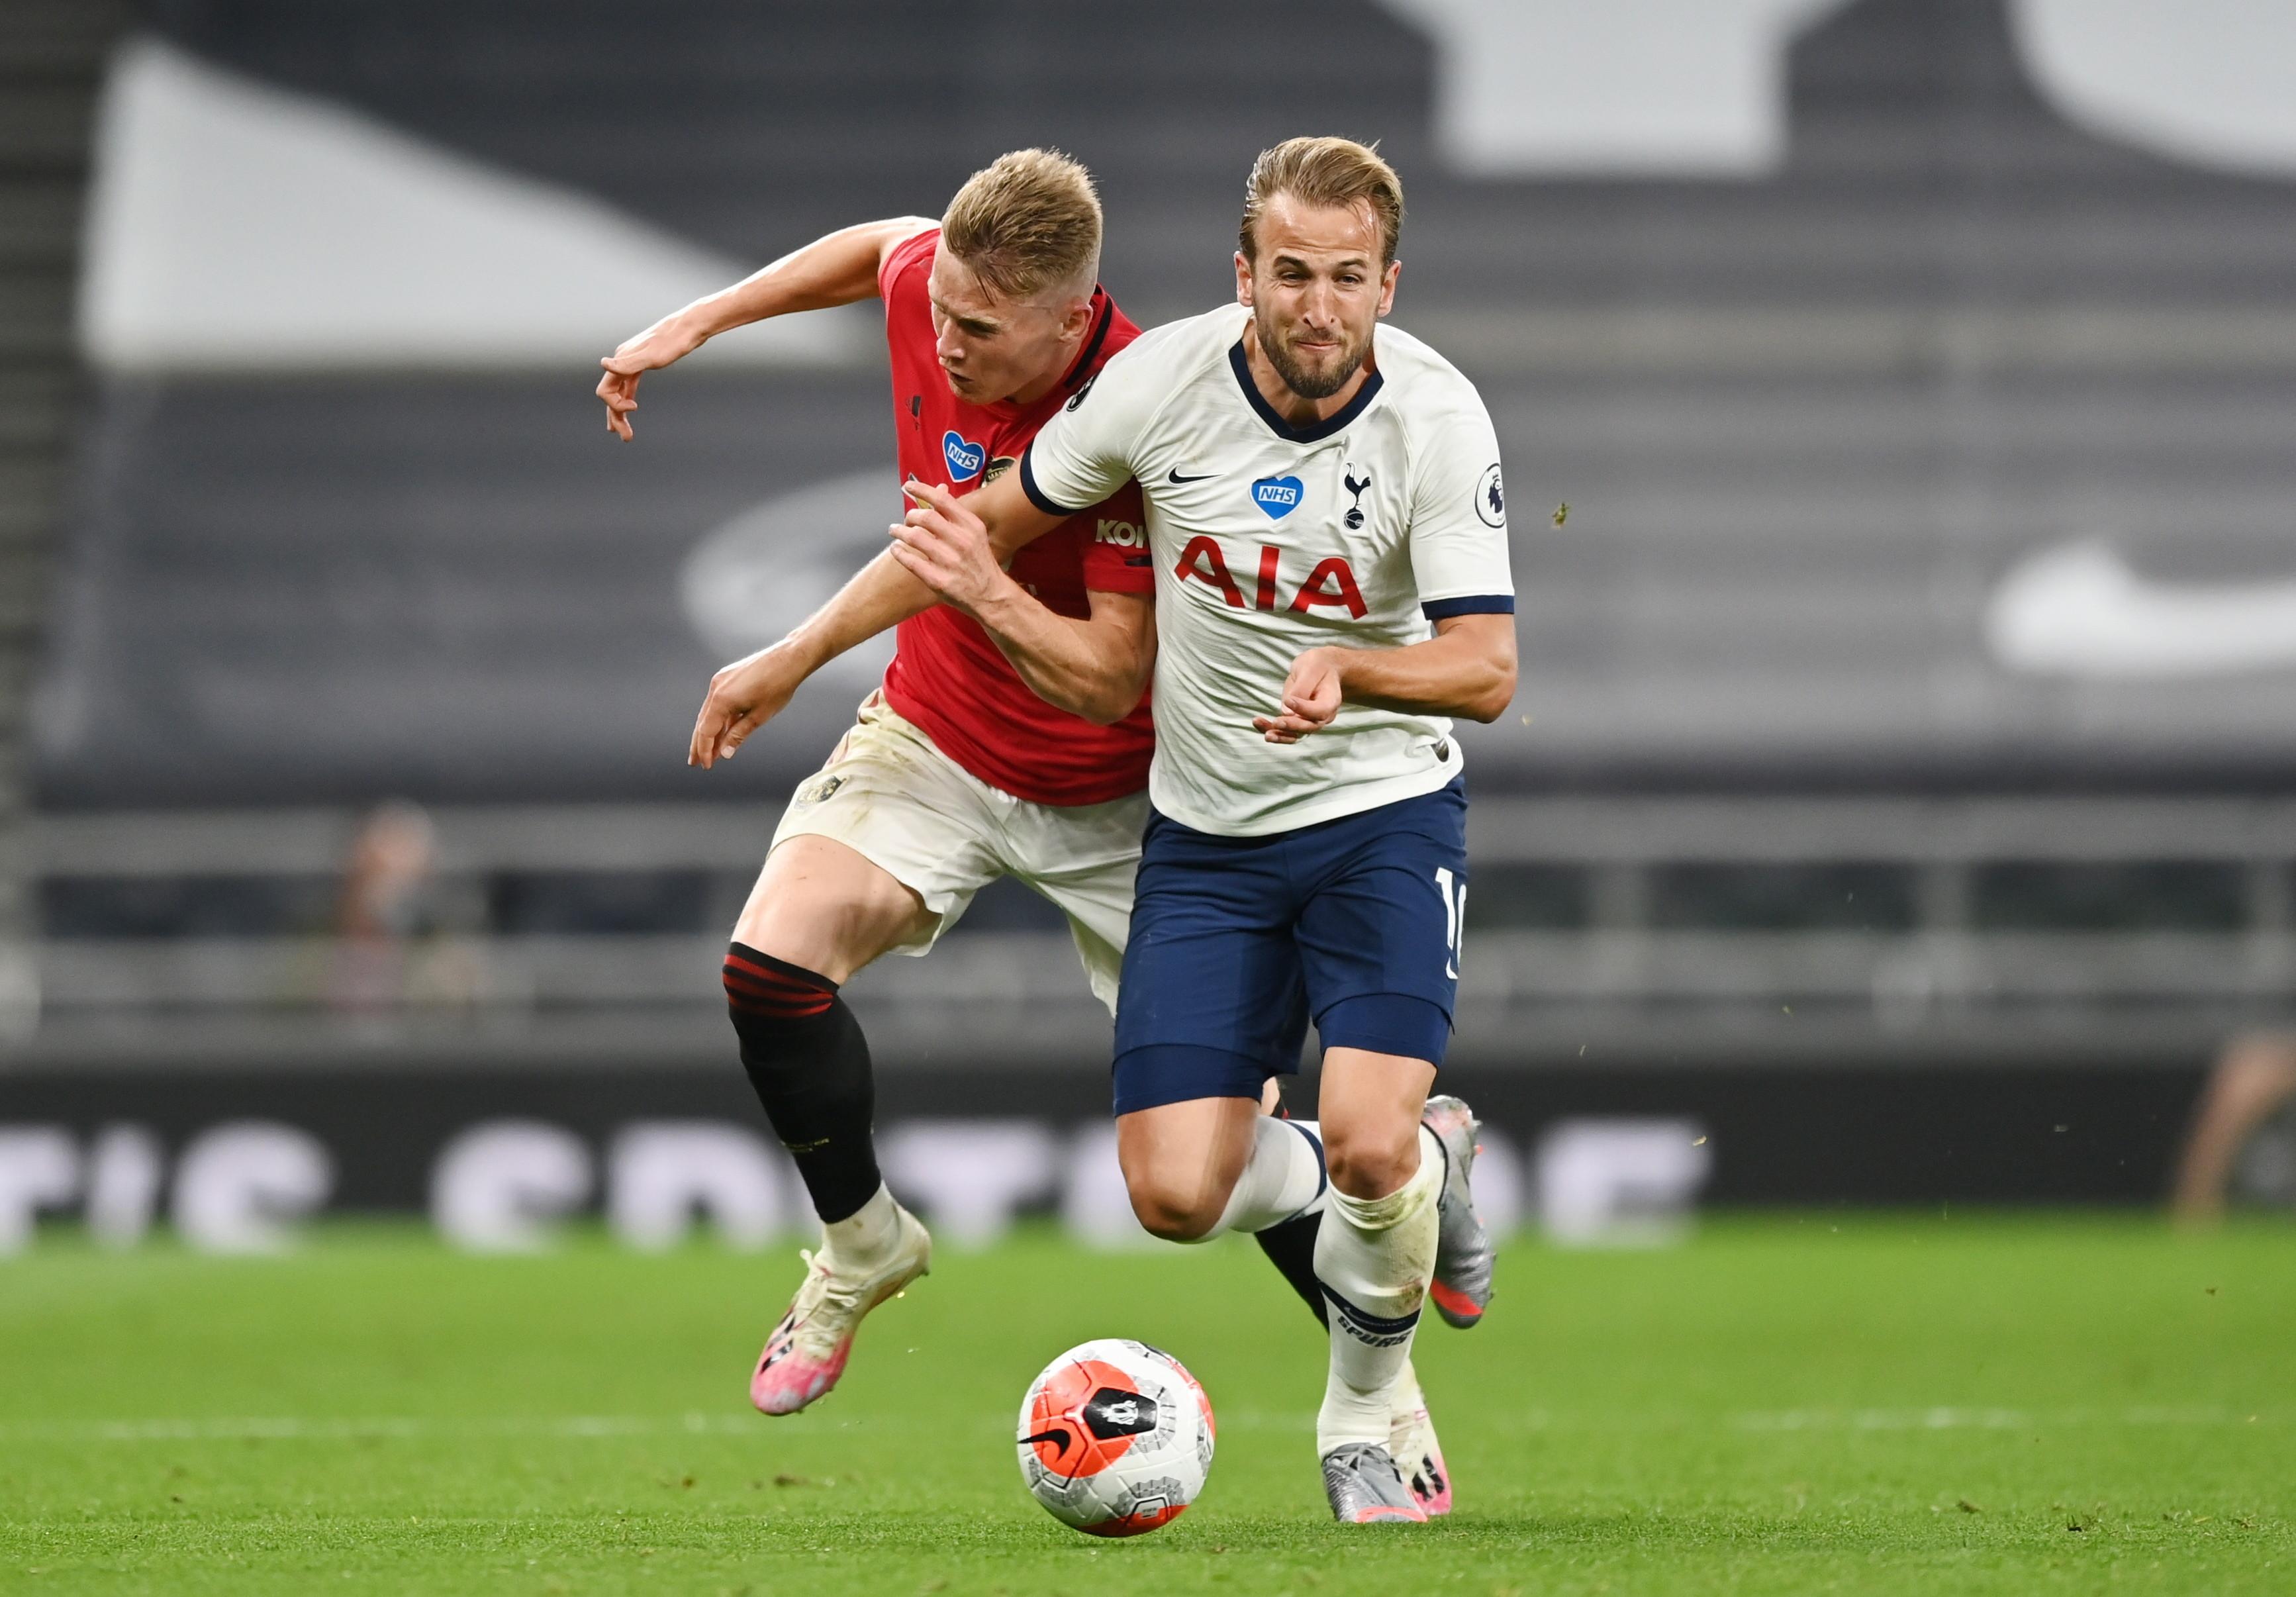 Premier League: Manchester United dogonił Tottenham Hotspur. Paul Pogba wrócił i pomógł - Sport WP SportoweFakty